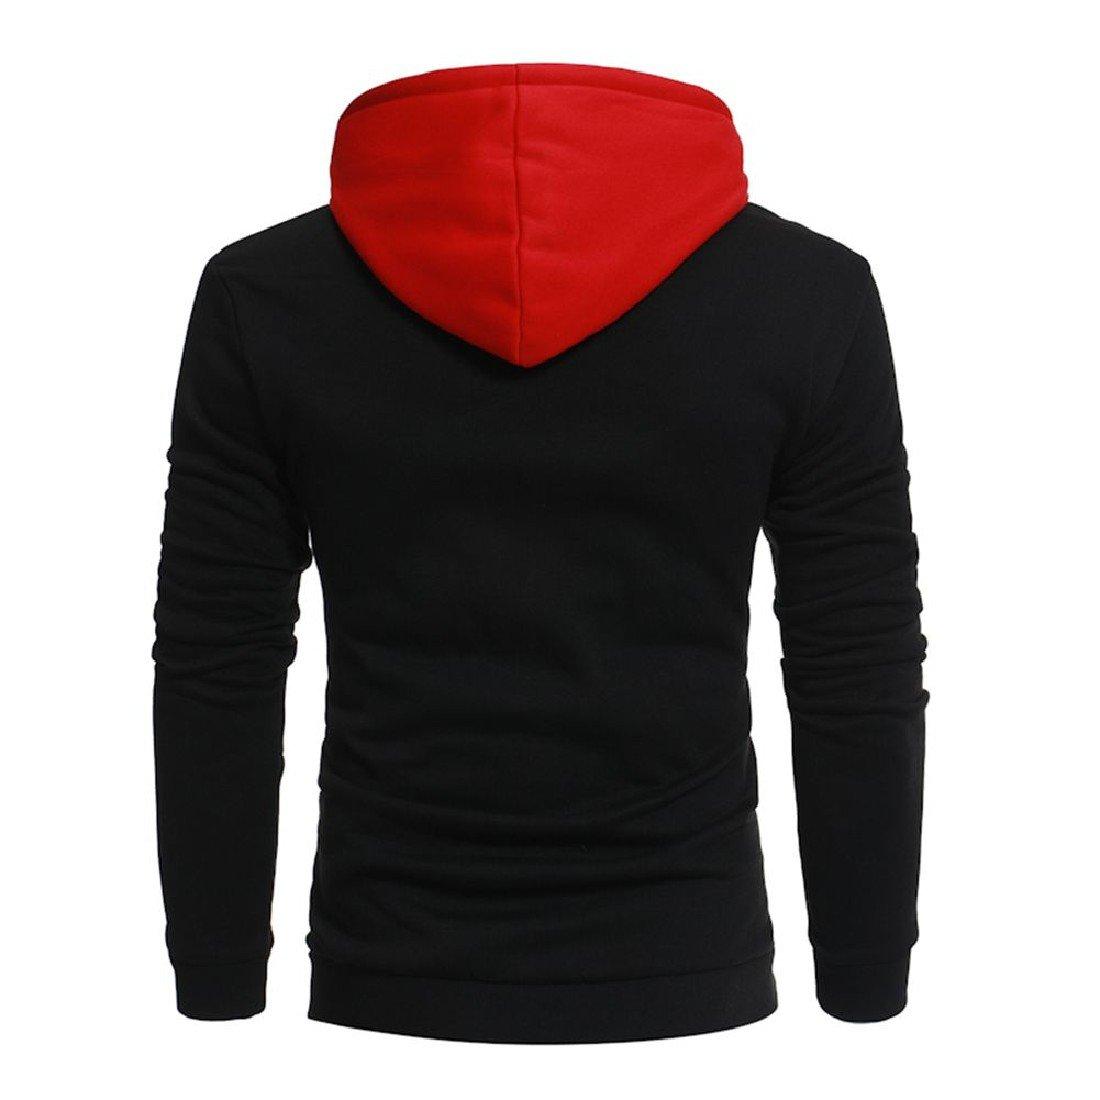 XiaoShop Mens Sports Comfy Long Sleeve Splice Hip Hop Hoodie Sweatshirts